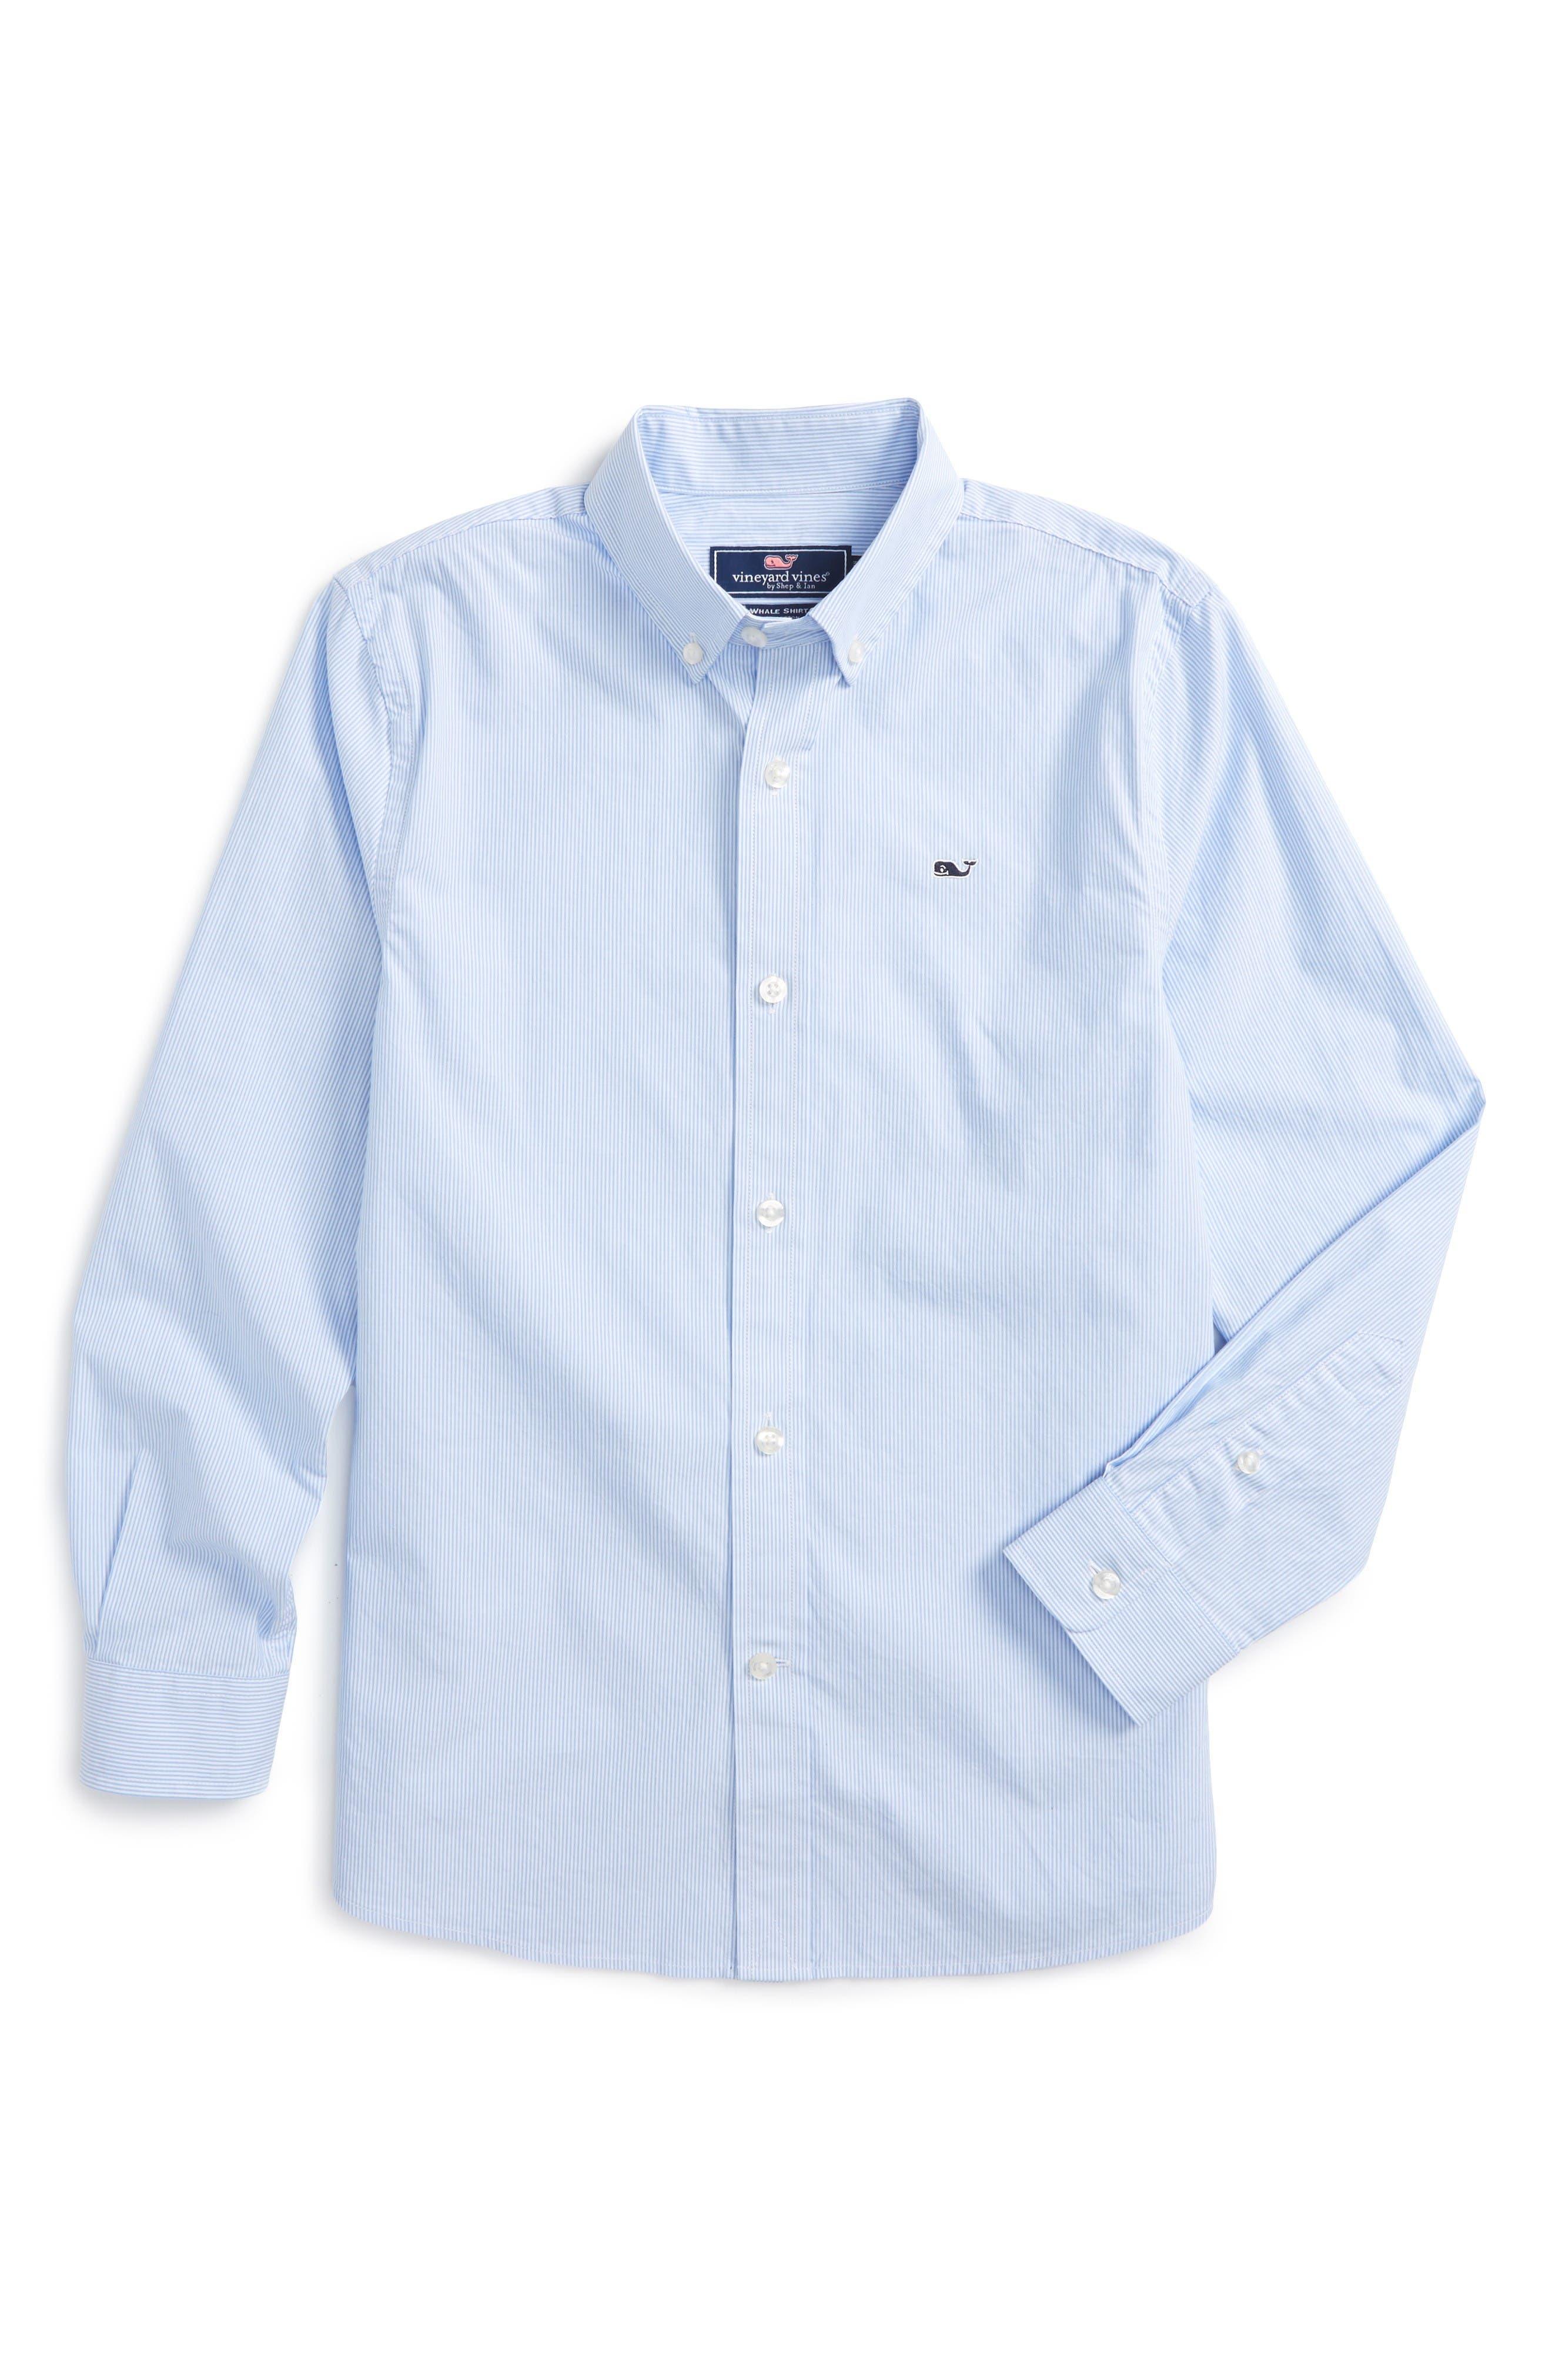 Alternate Image 1 Selected - Vineyard Vines Fine Line Stripe - Whale Woven Shirt (Big Boys)